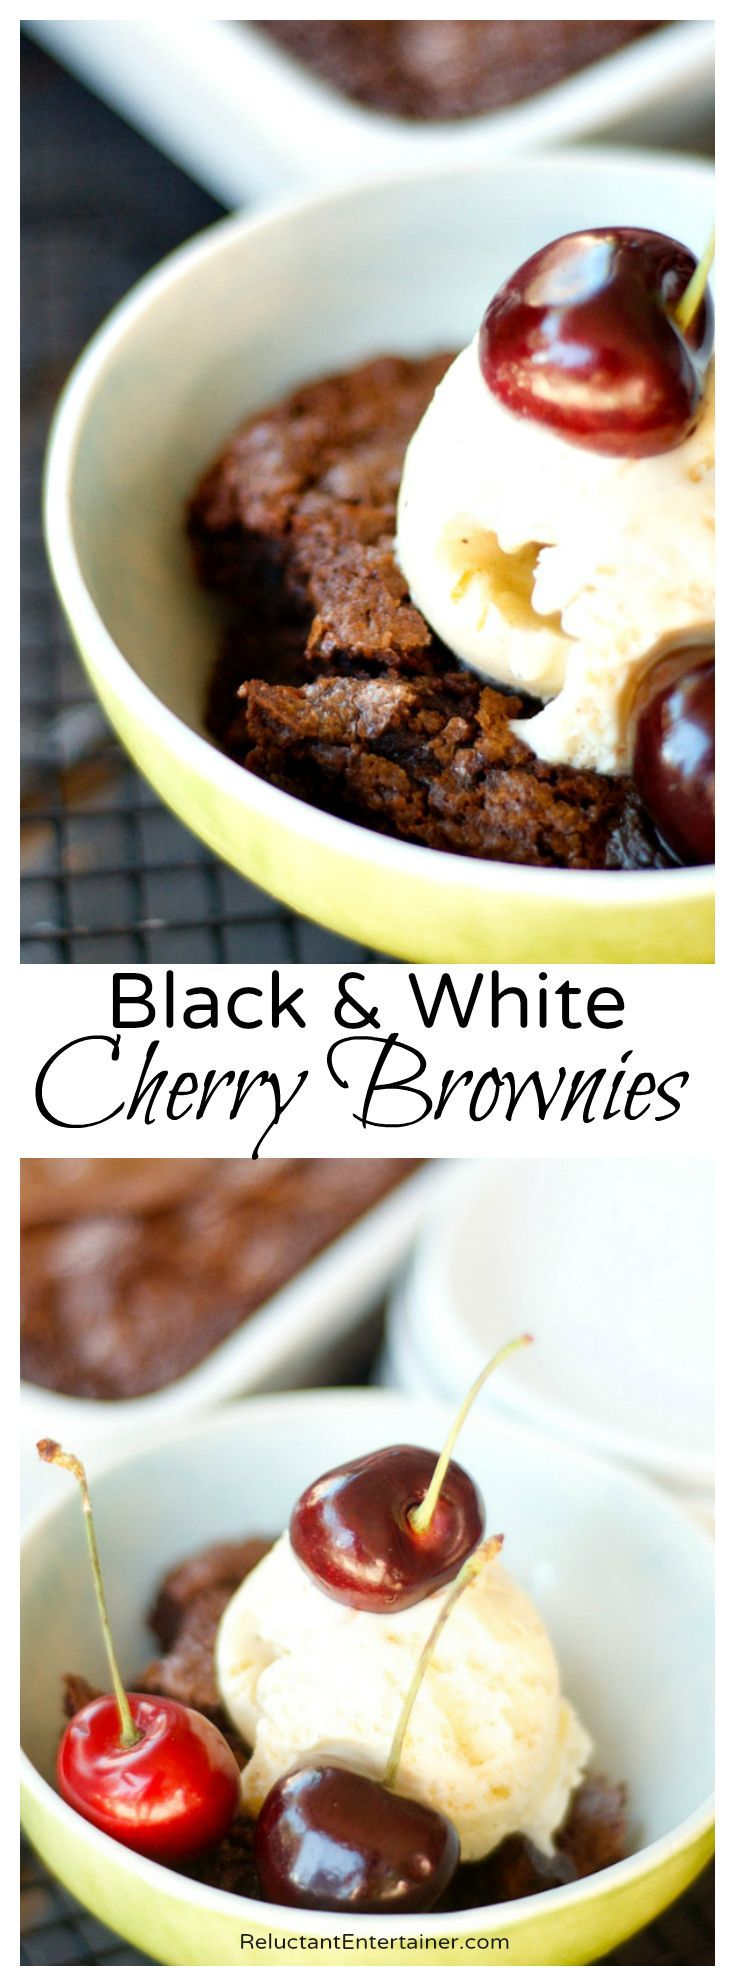 Black and White Cherry Brownies Recipe